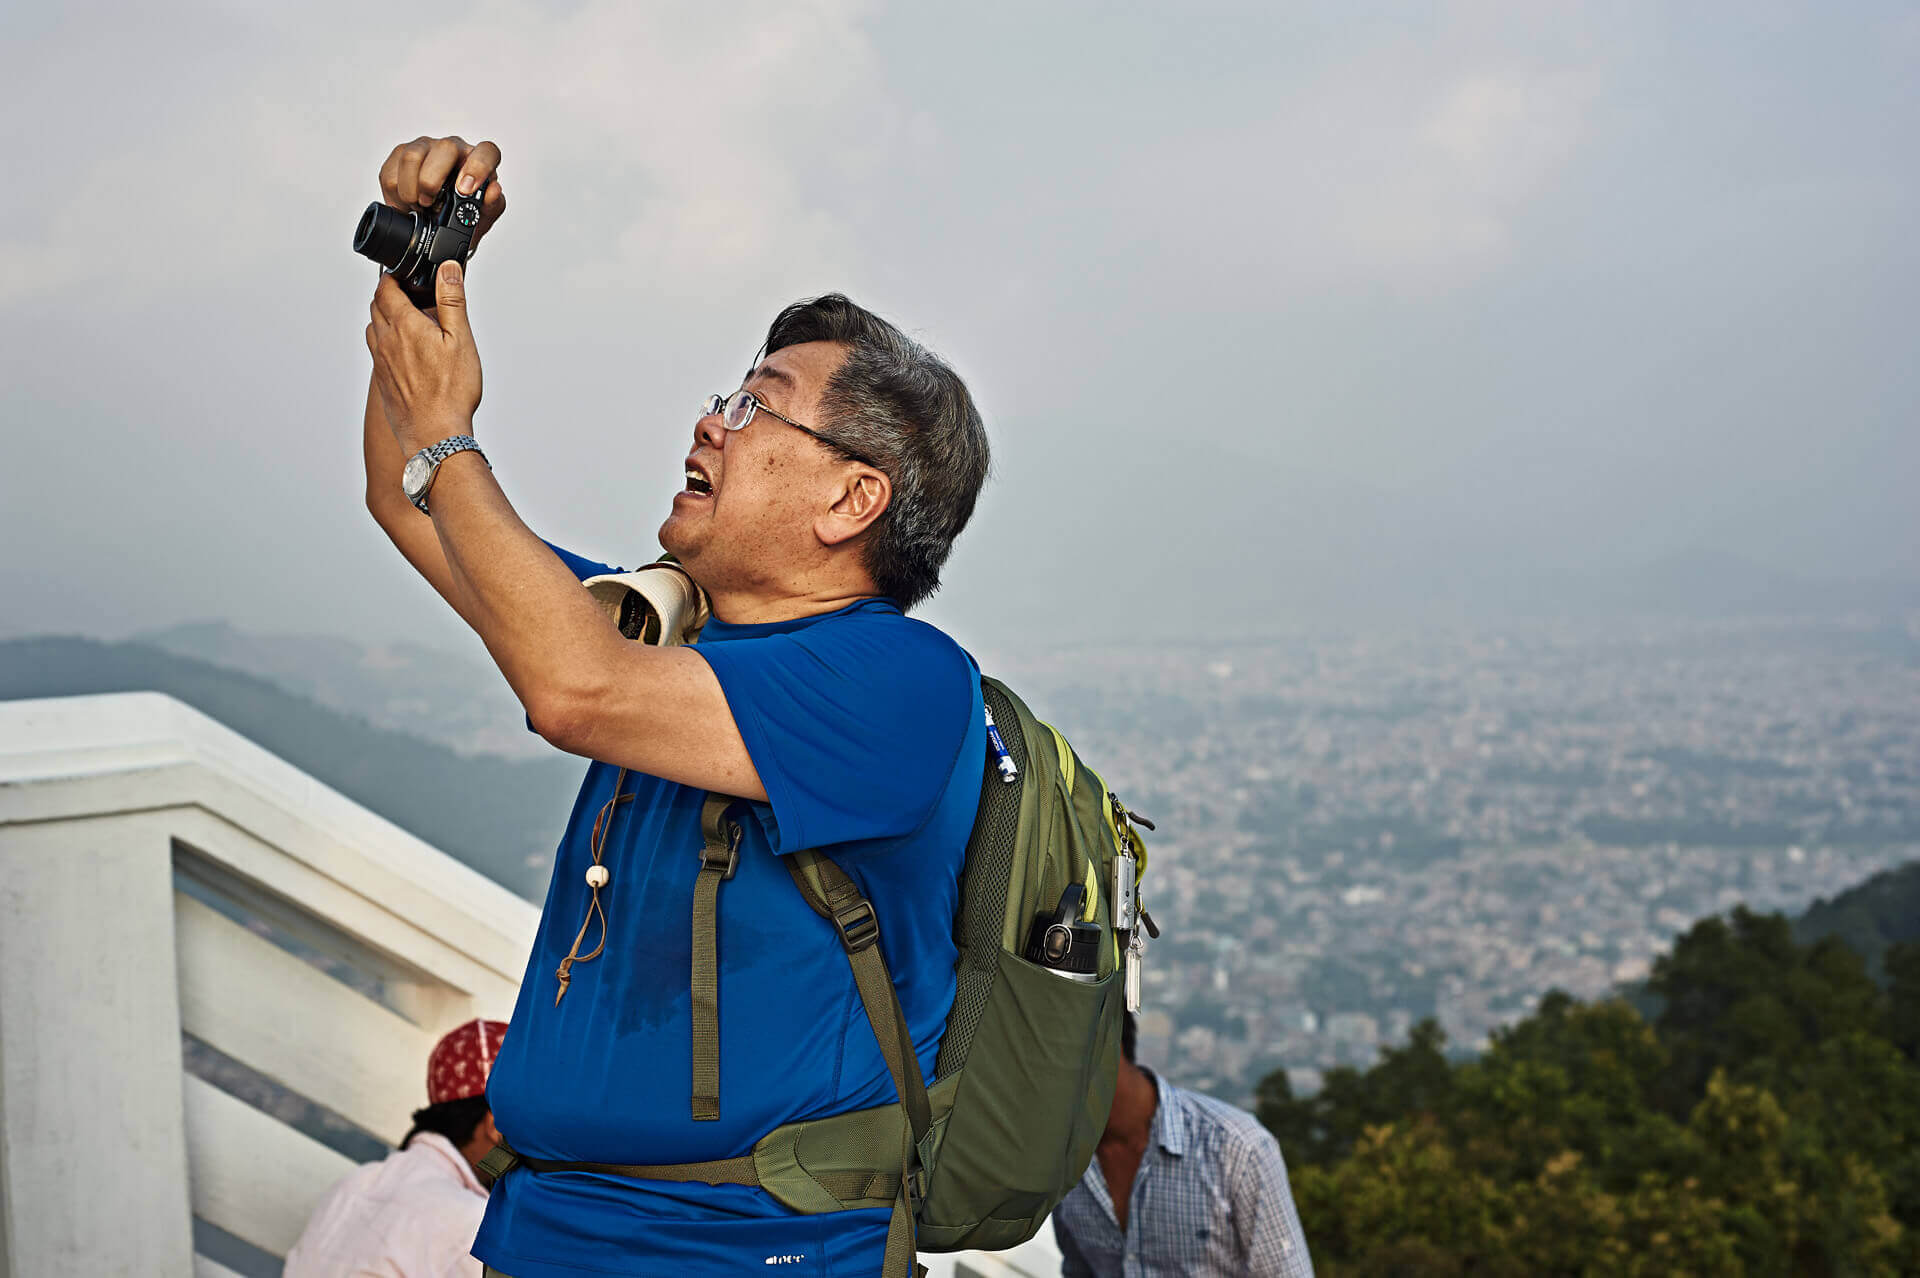 nepal_pokhara_20131029_0210-Kopie